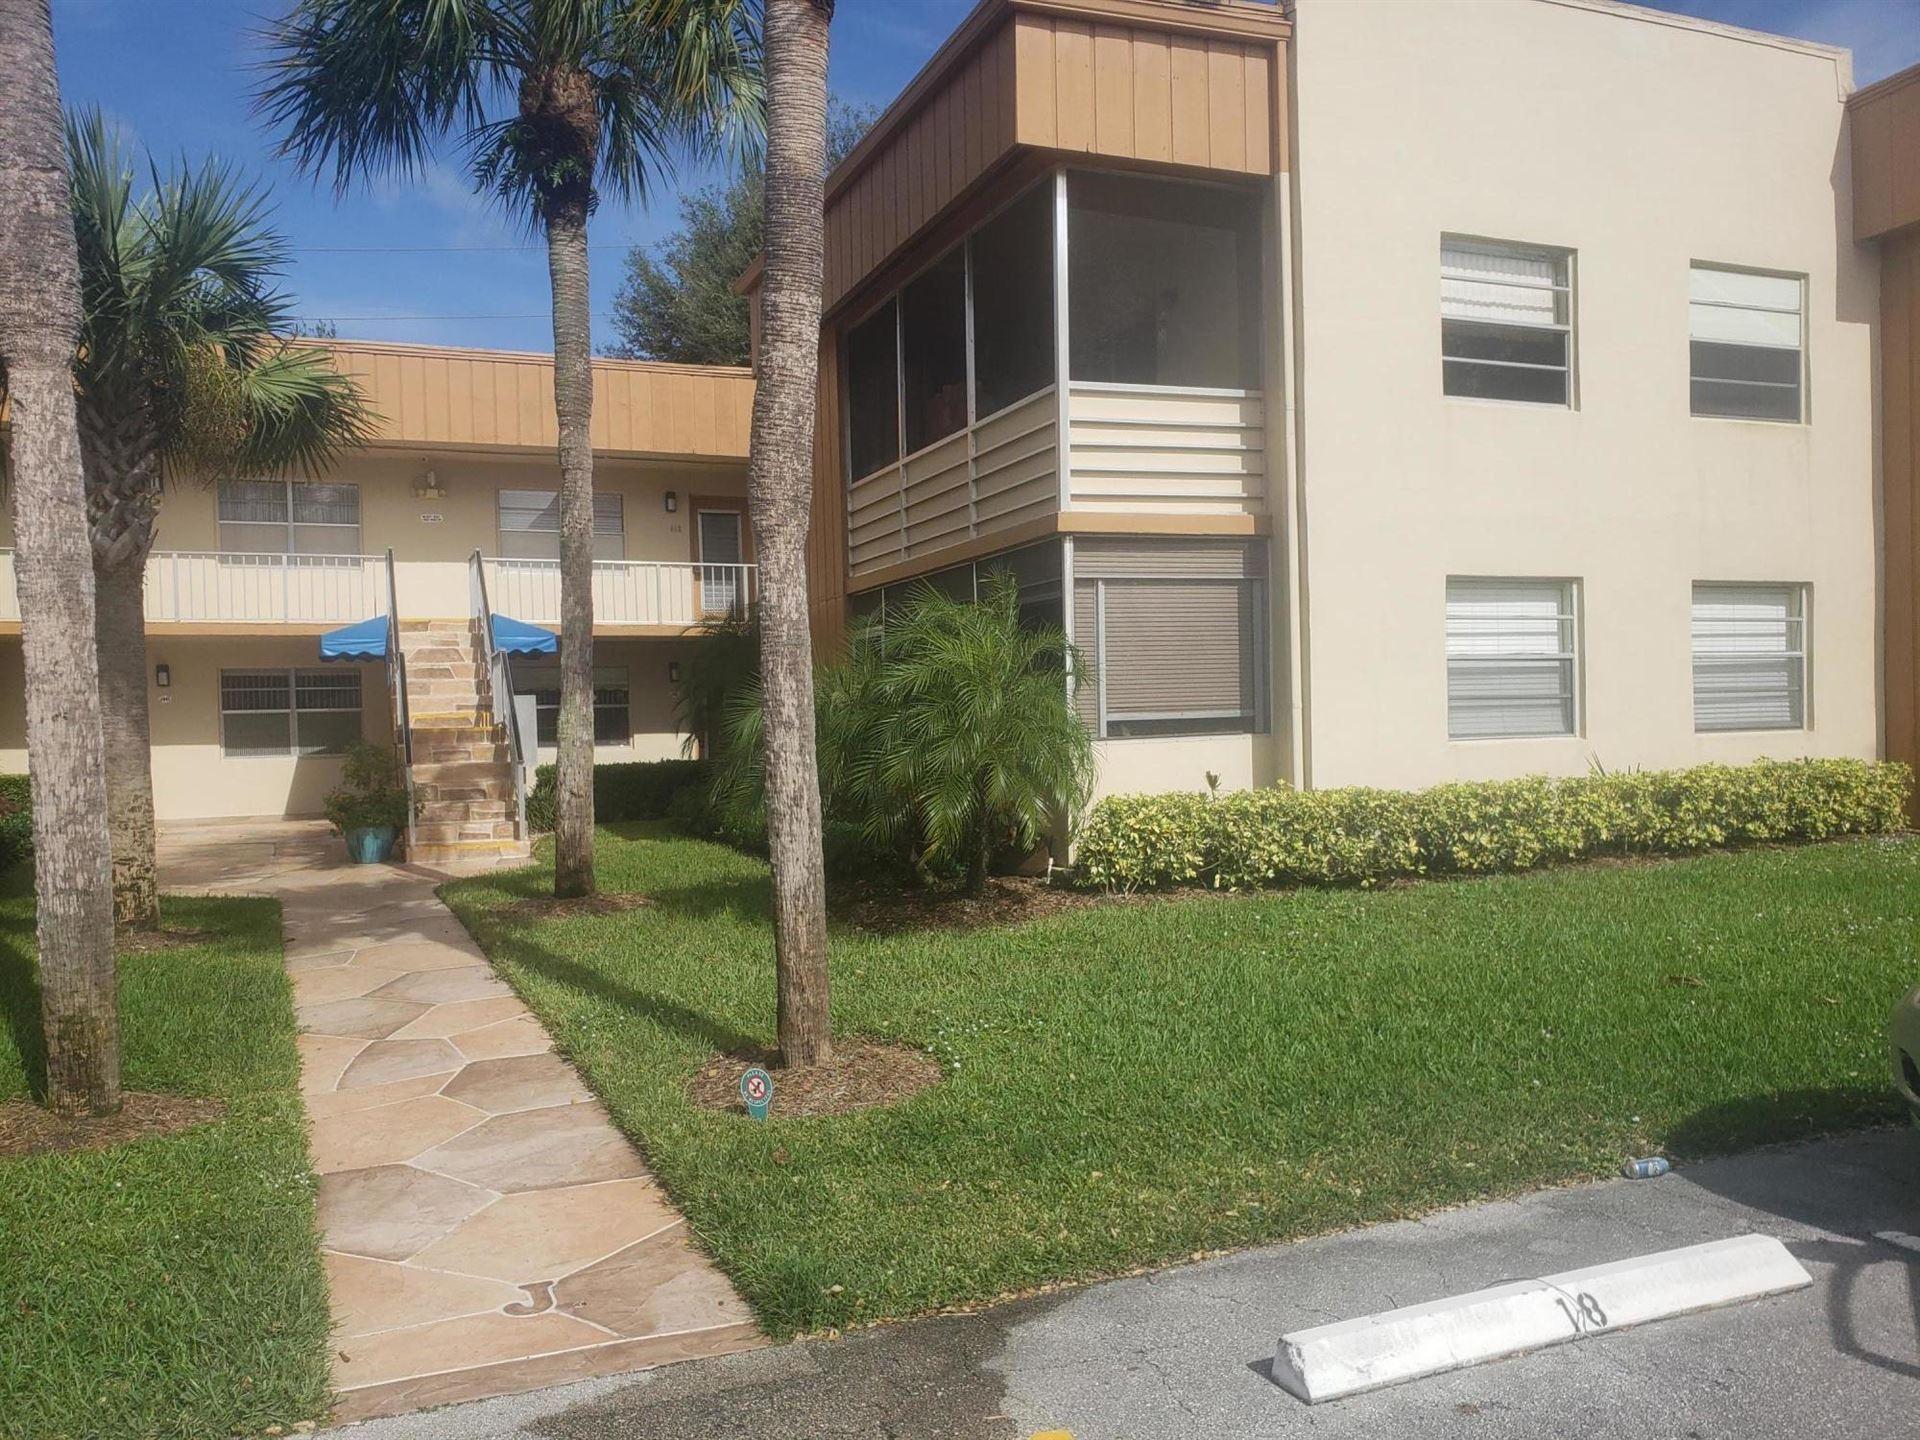 443 Normandy J Lane #443, Delray Beach, FL 33484 - MLS#: RX-10698871